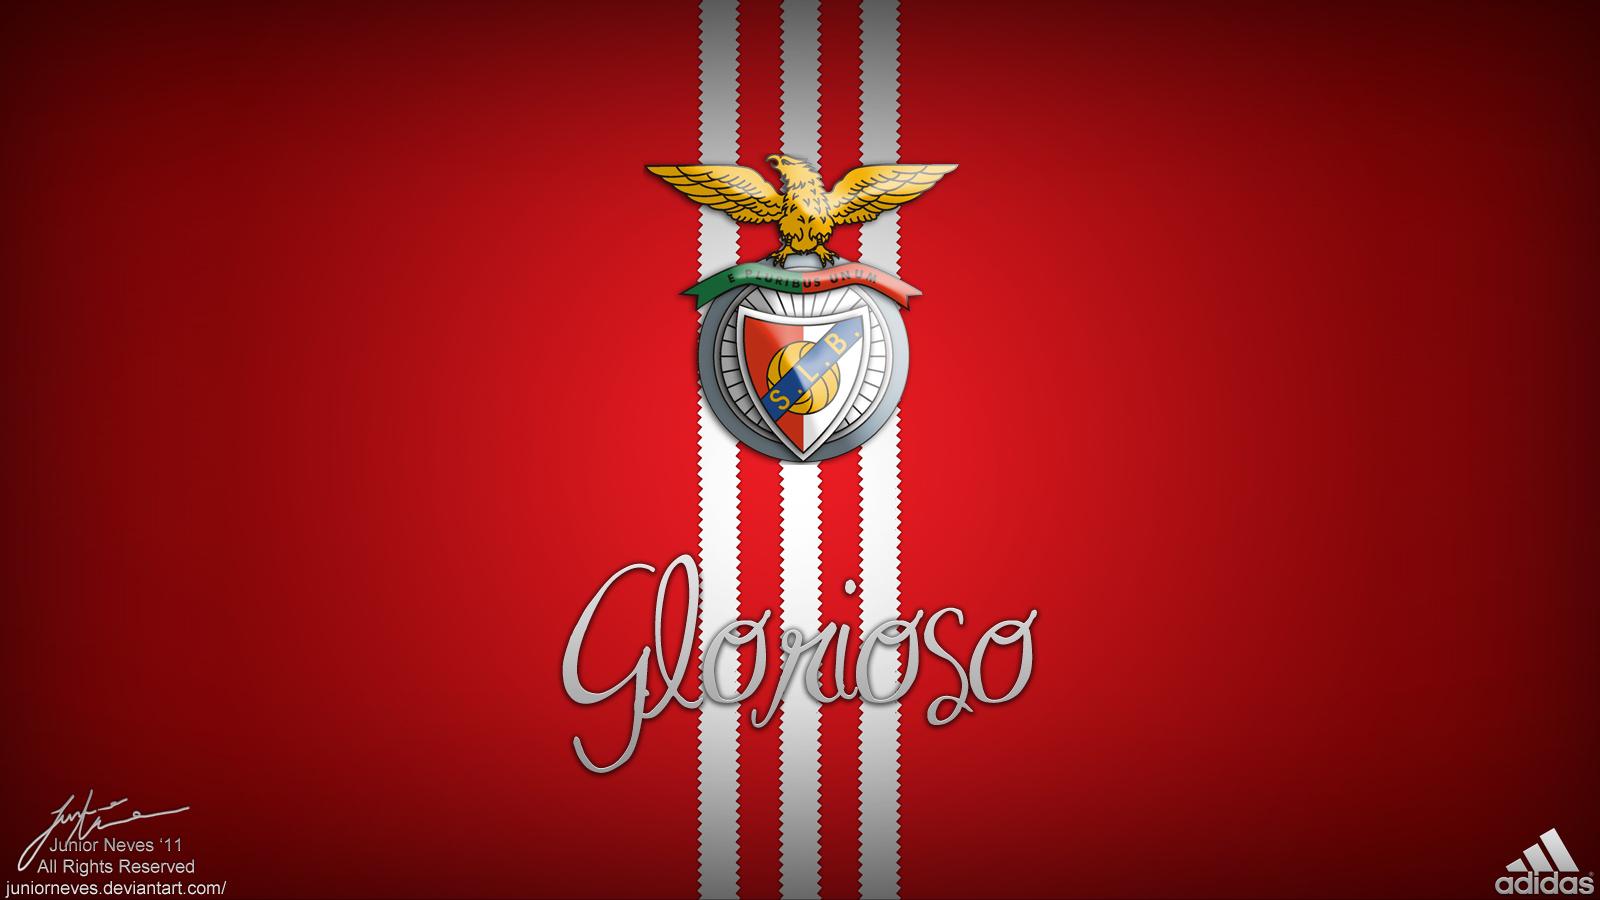 Adidas Wallpaper Iphone 6 Benfica Glorioso 1904 Wallpapers Benfica